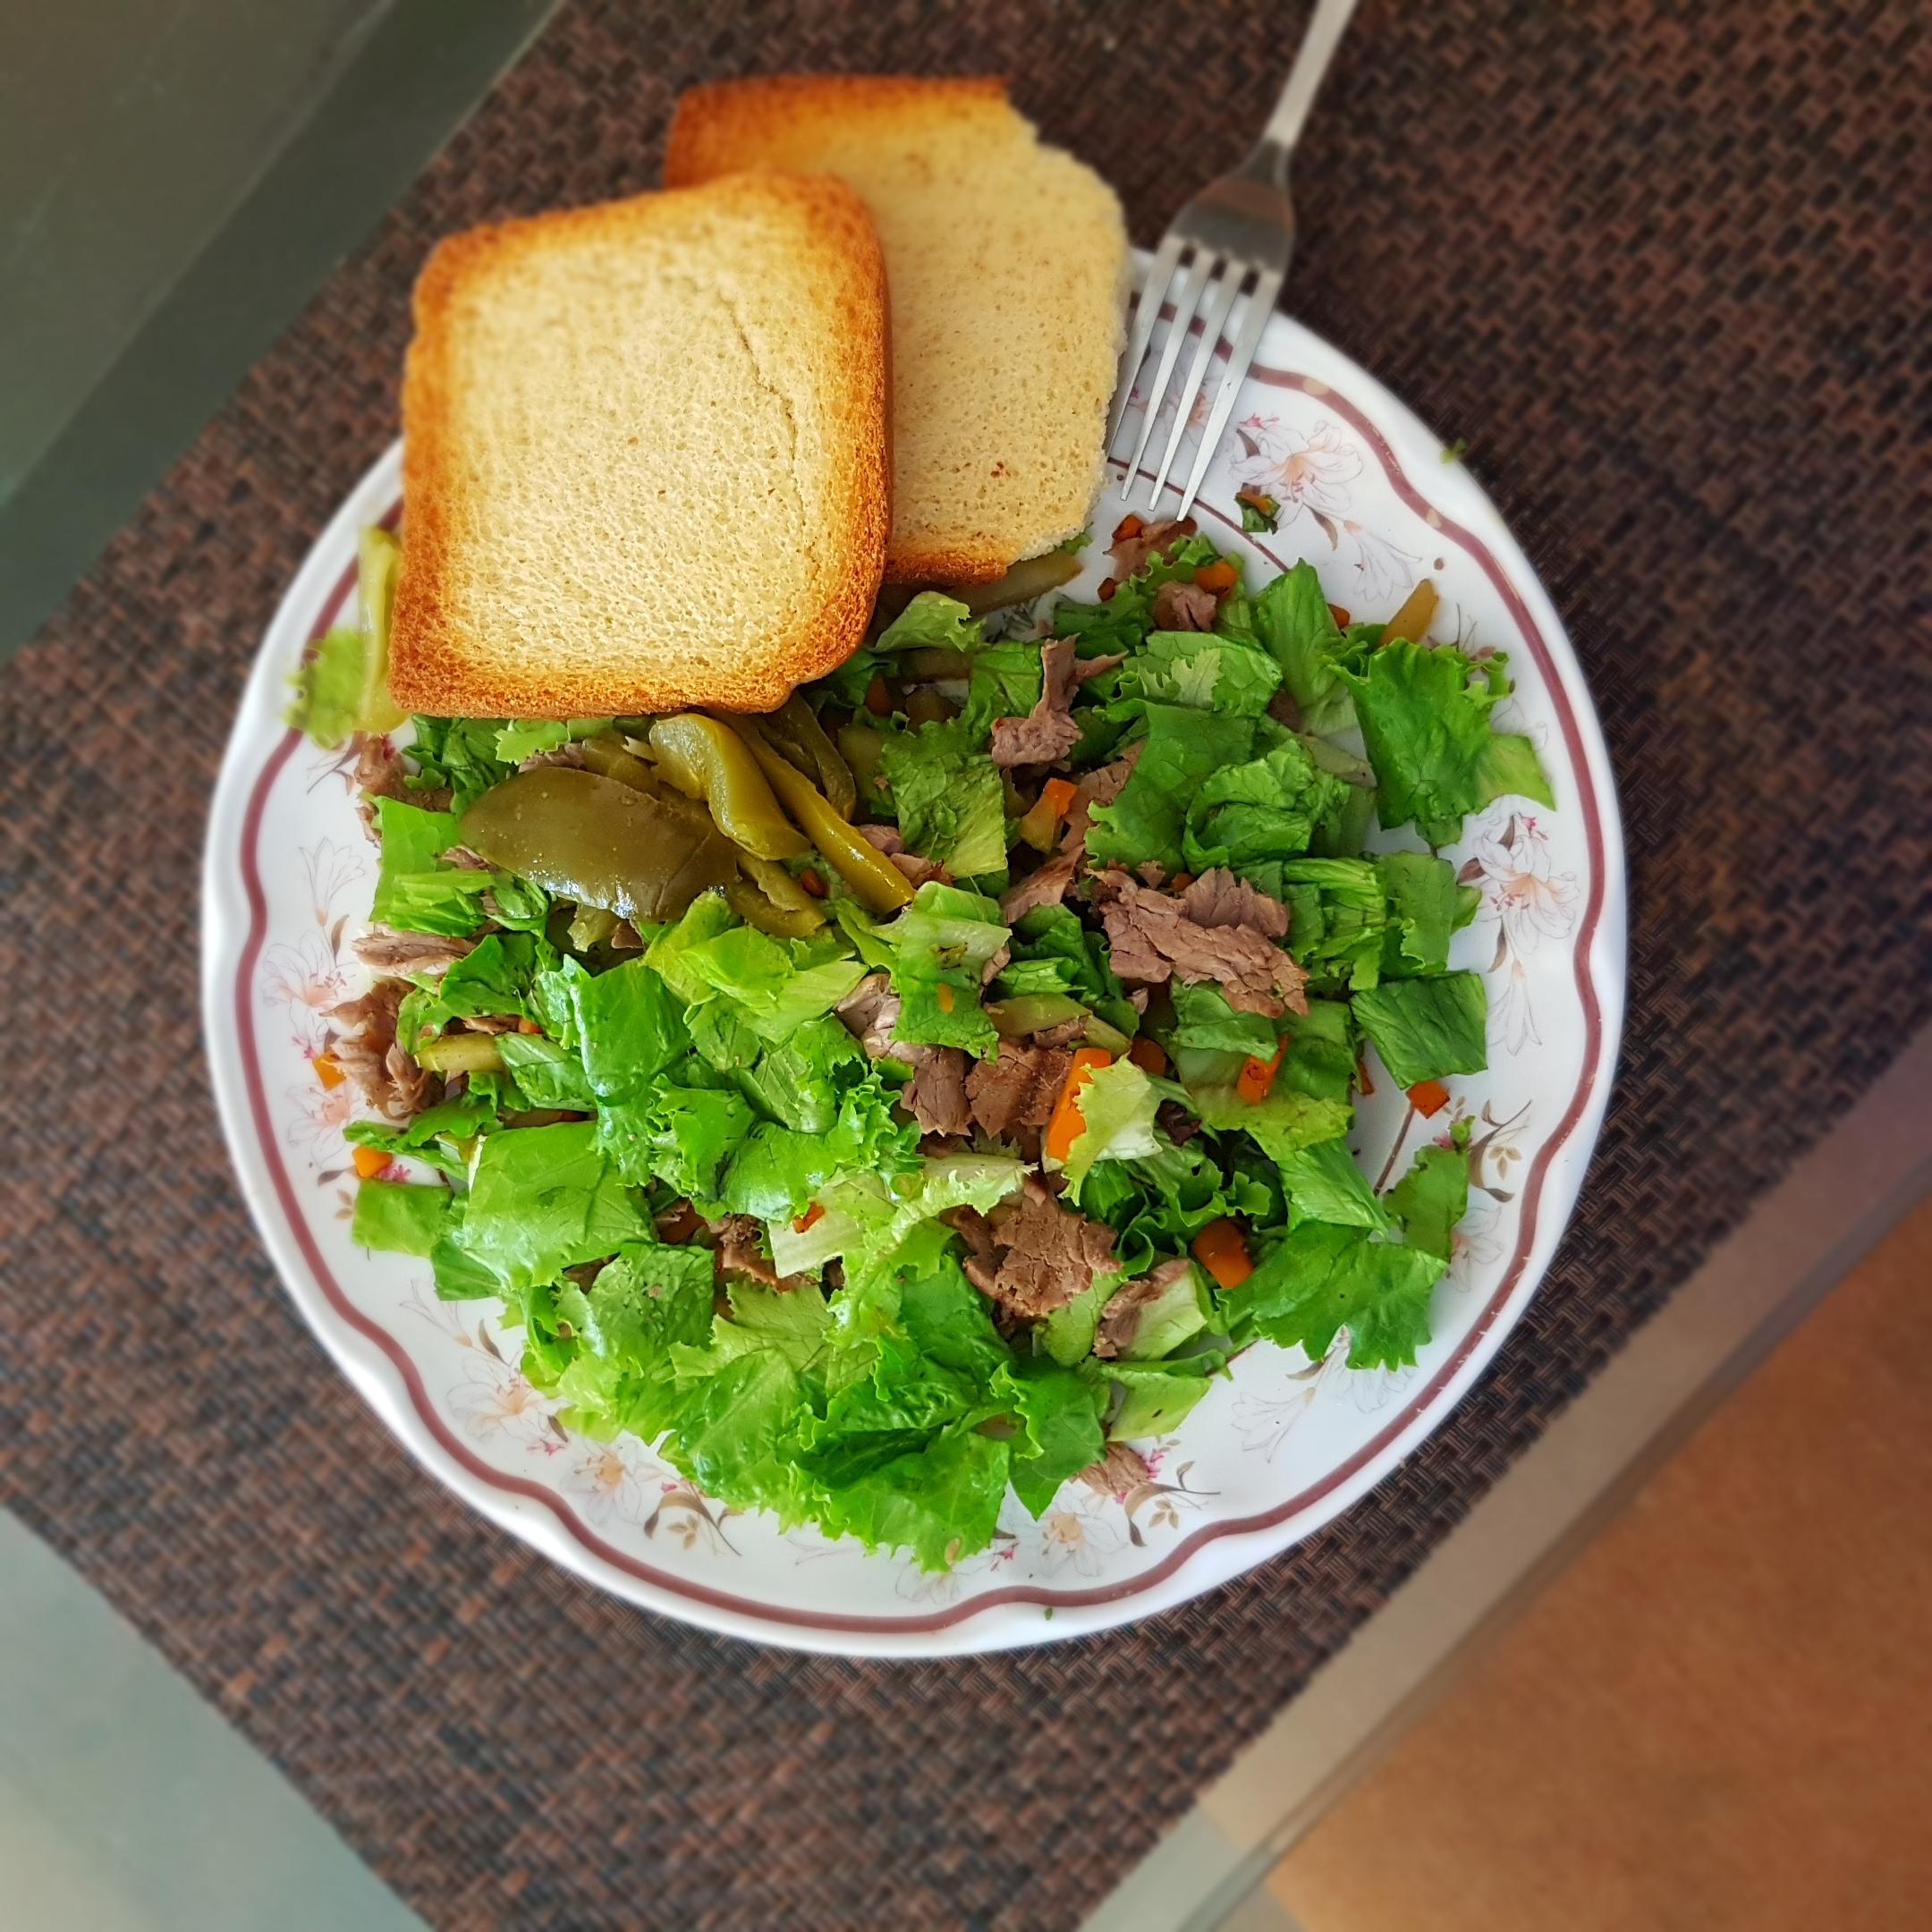 Ensalada con bistec